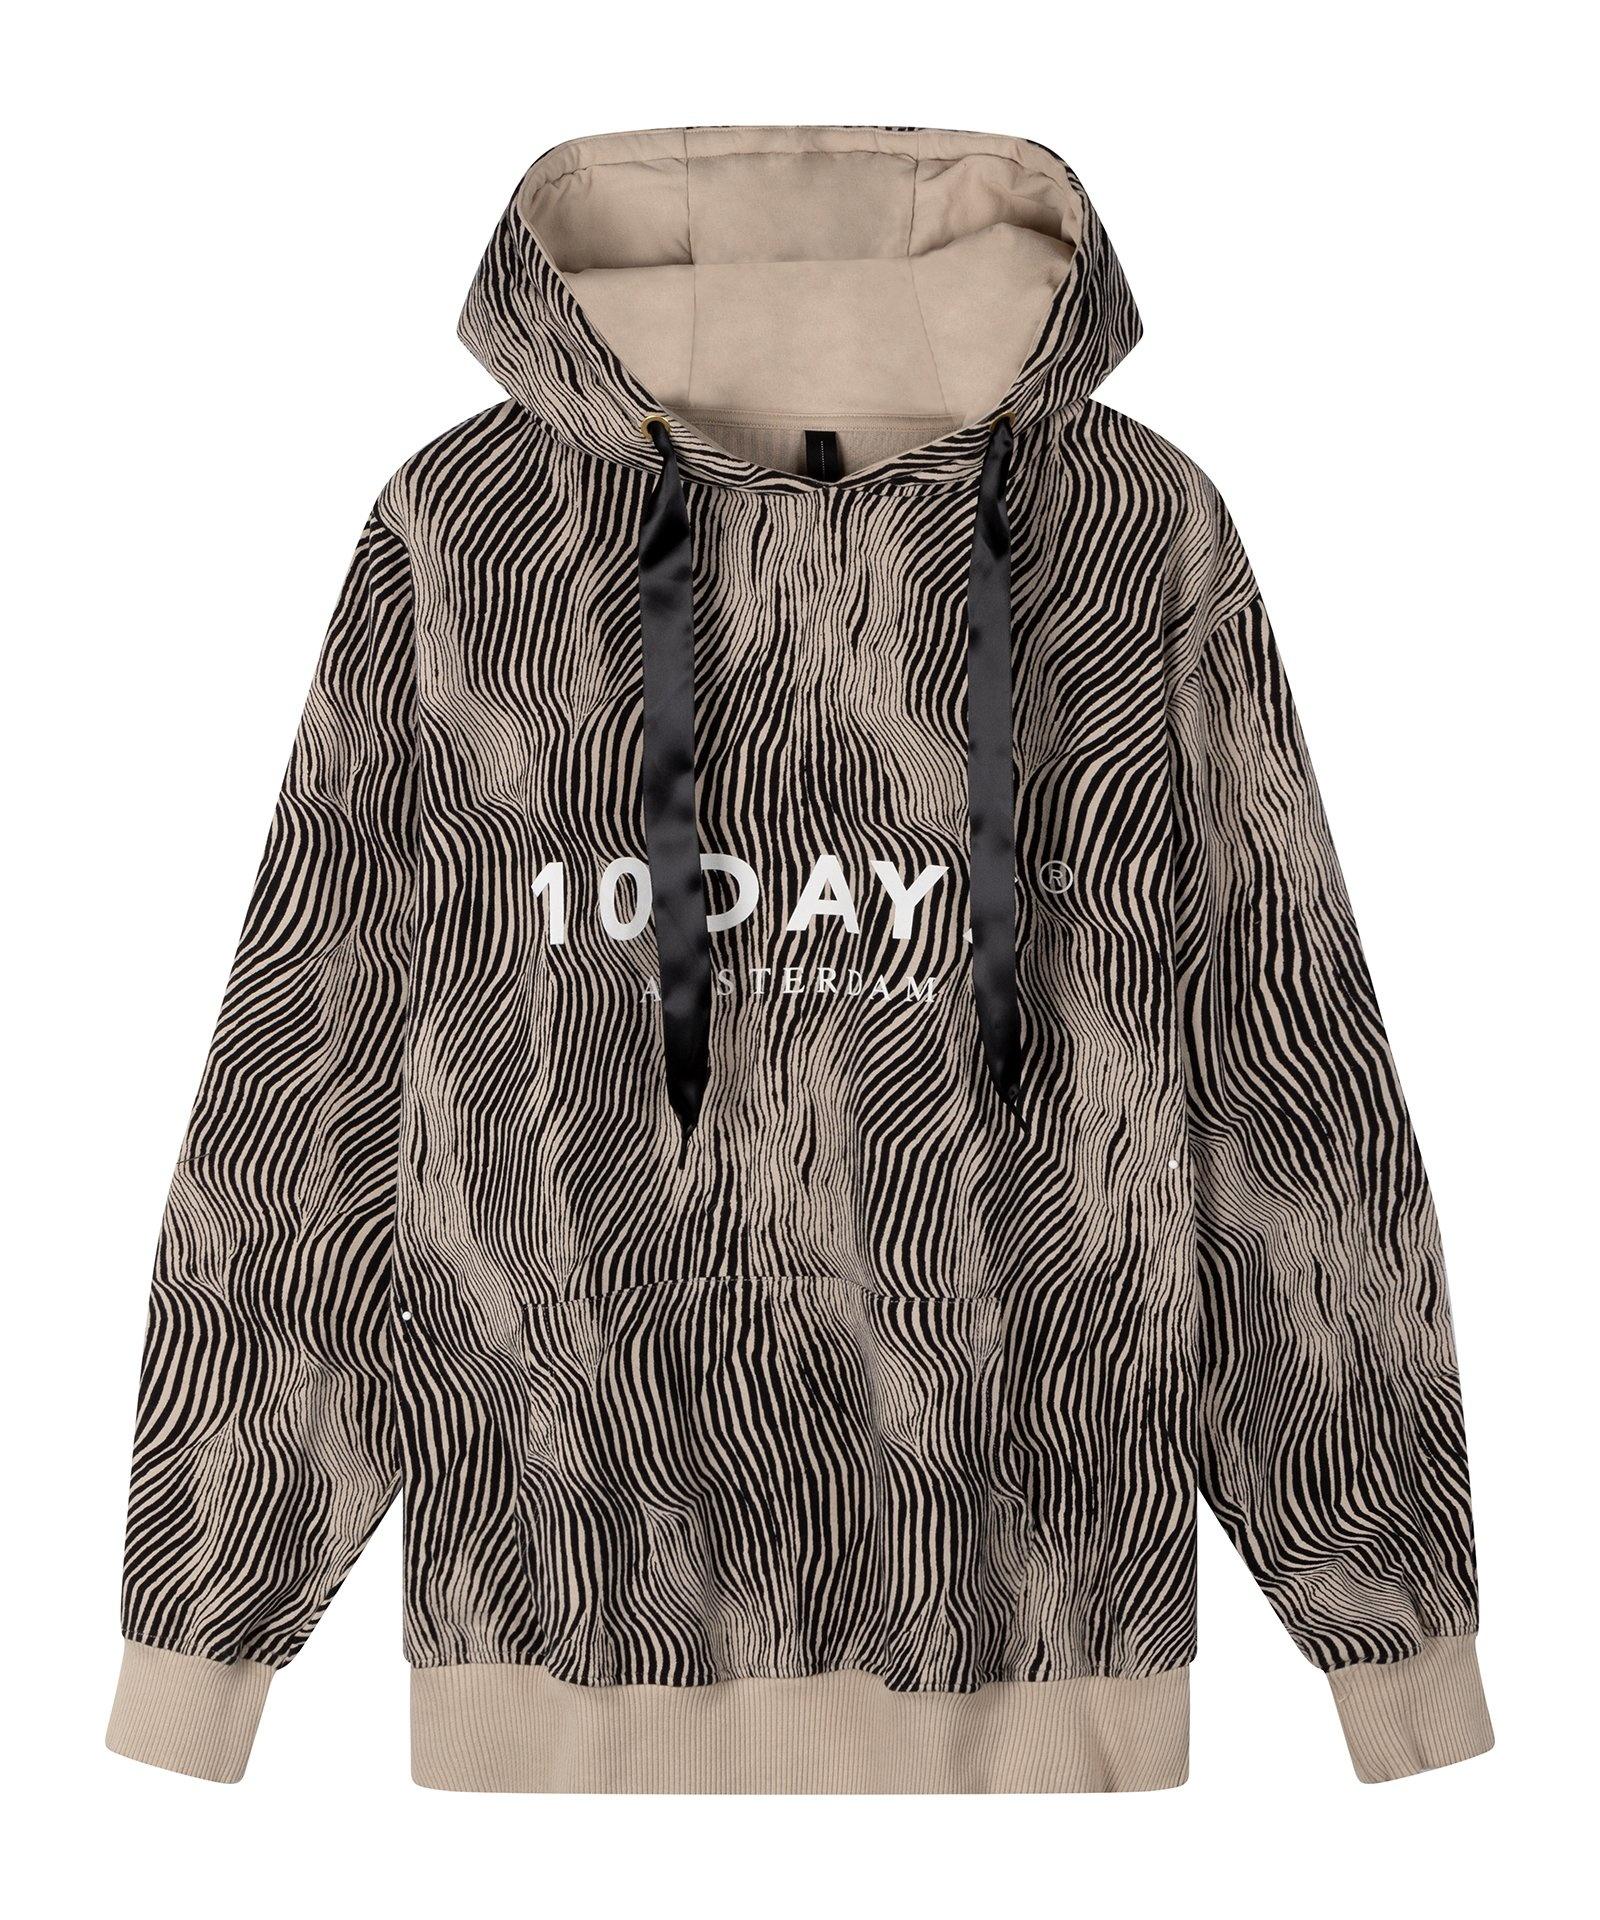 Trui hoodie zebra safari-1